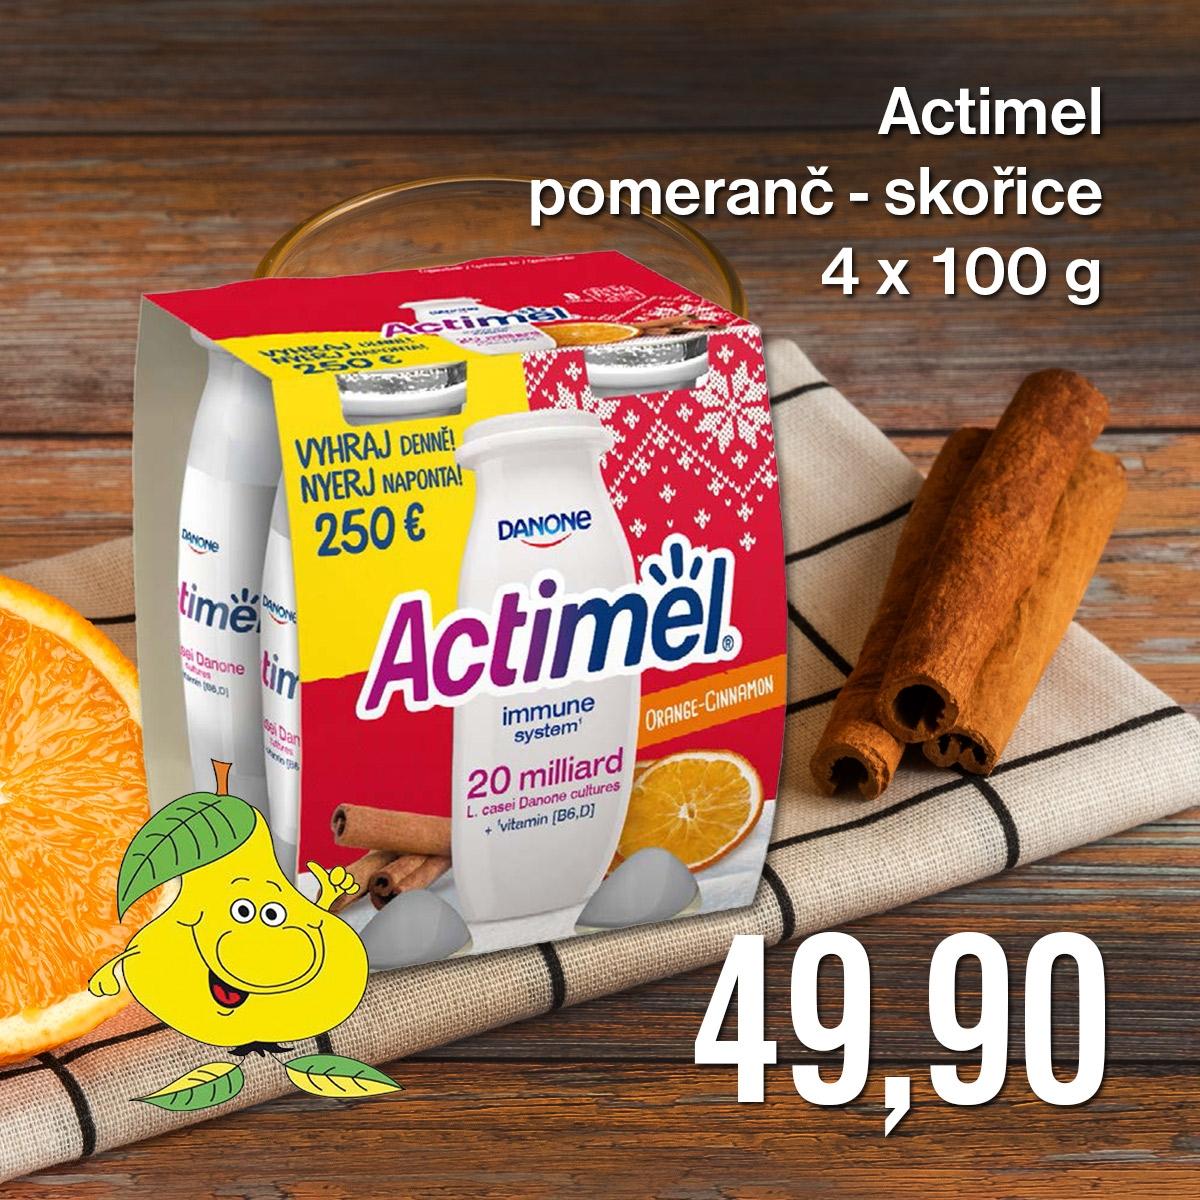 Actimel pomeranč-skořice 4 x 100 g